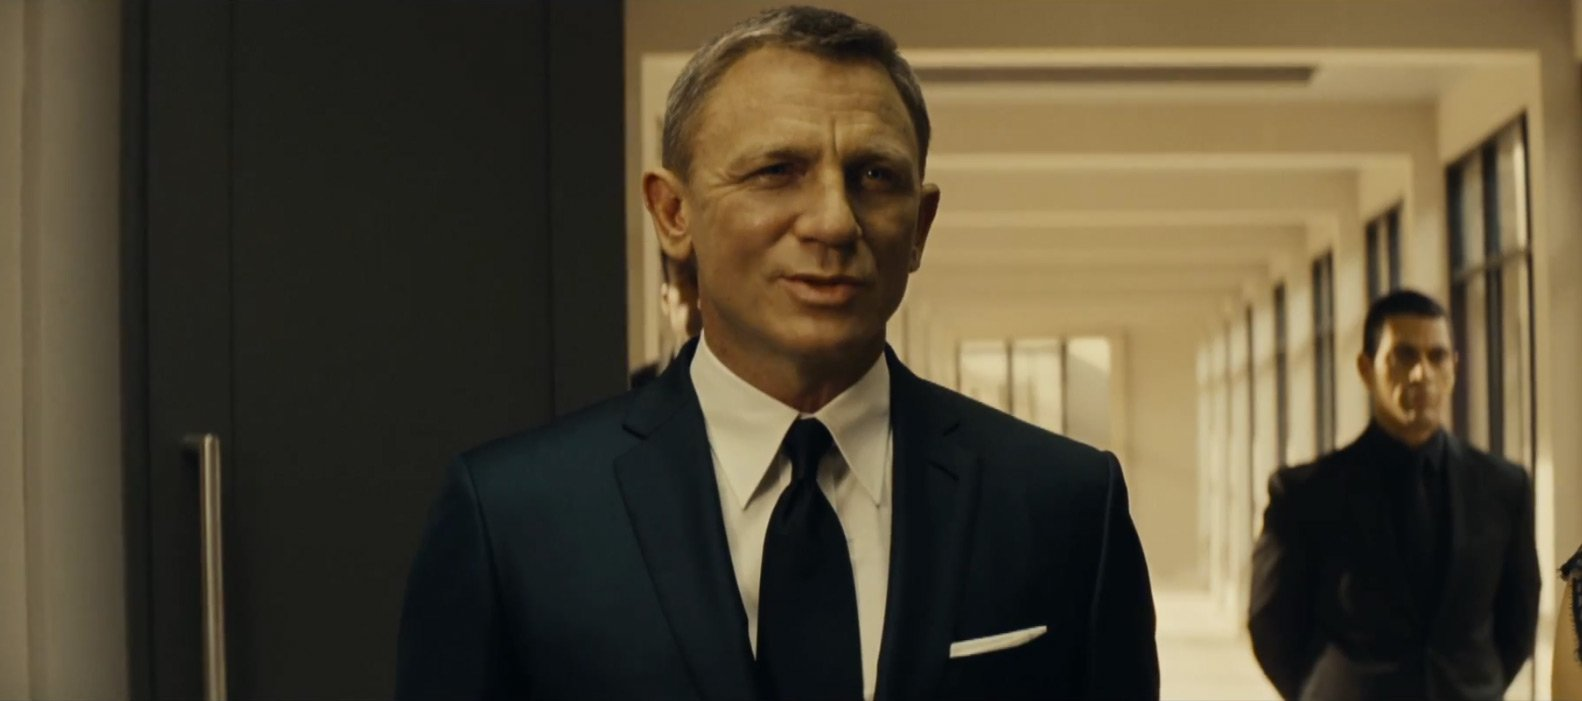 The Final Spectre Trailer: Blue Sharkskin Suit and Light Brown